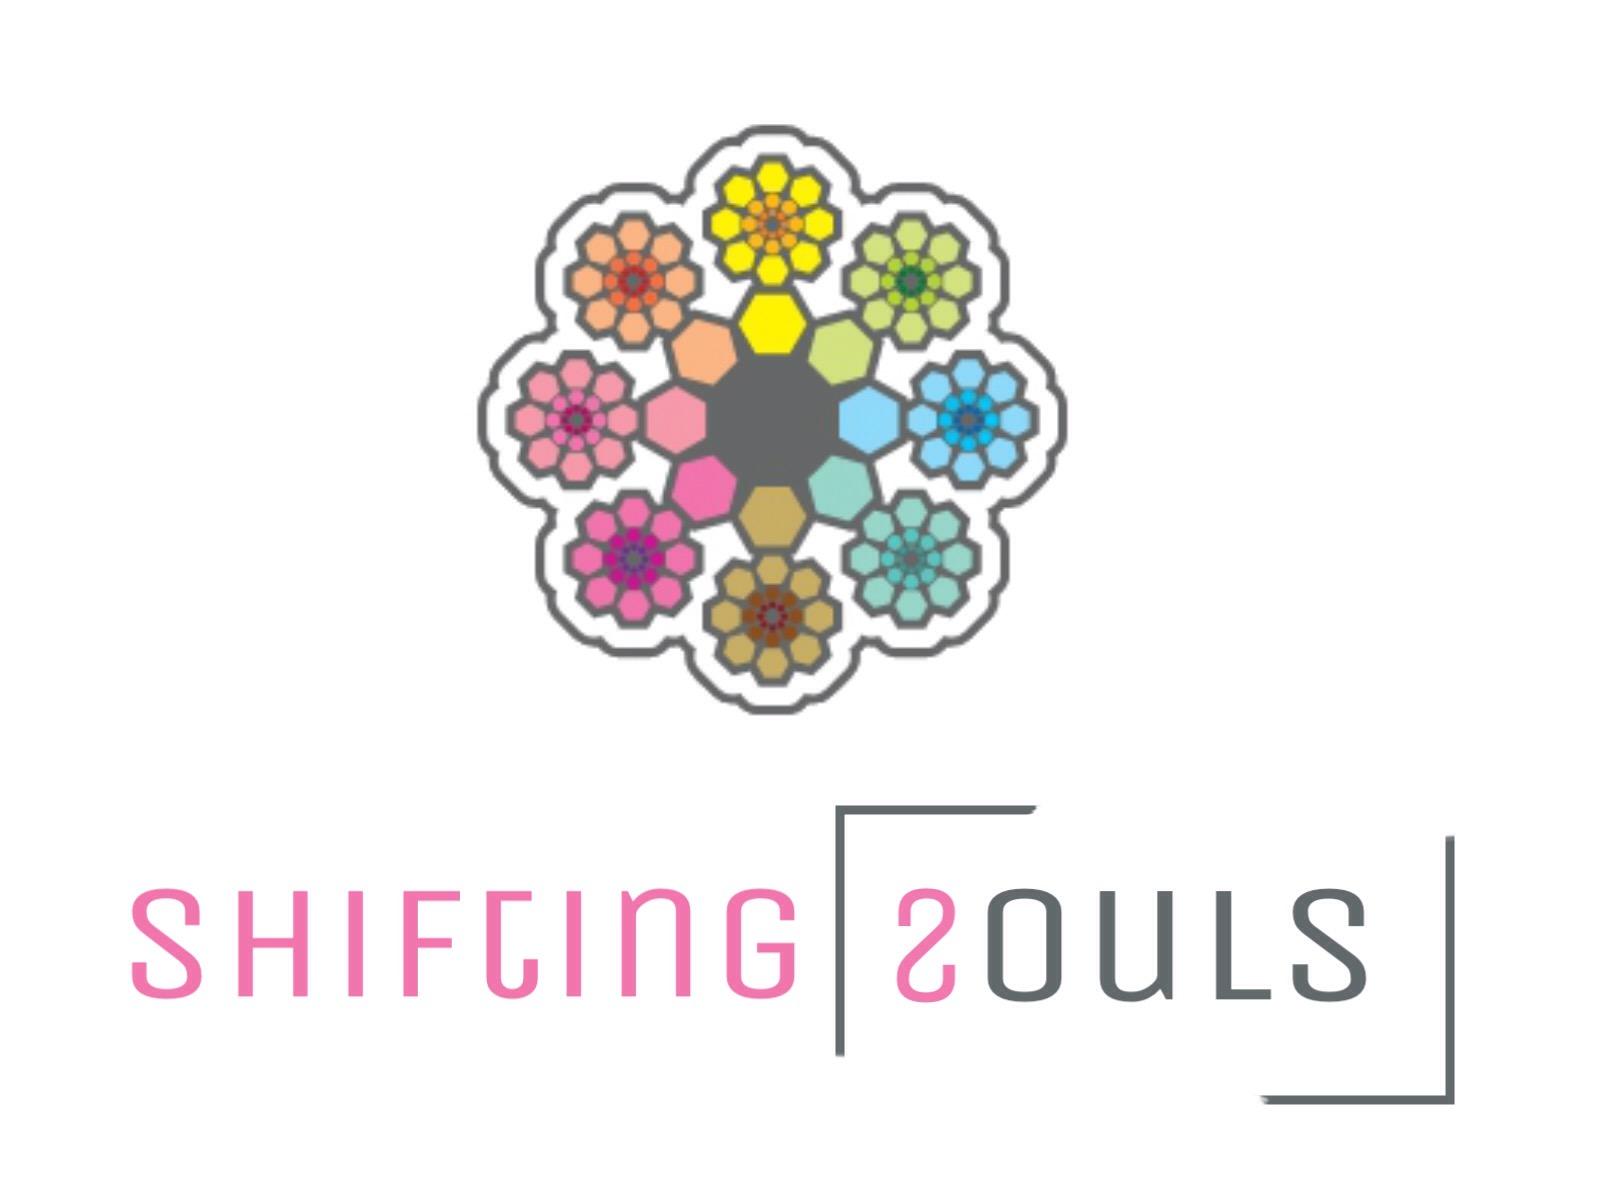 Shifting Souls by Marcela Restrepo